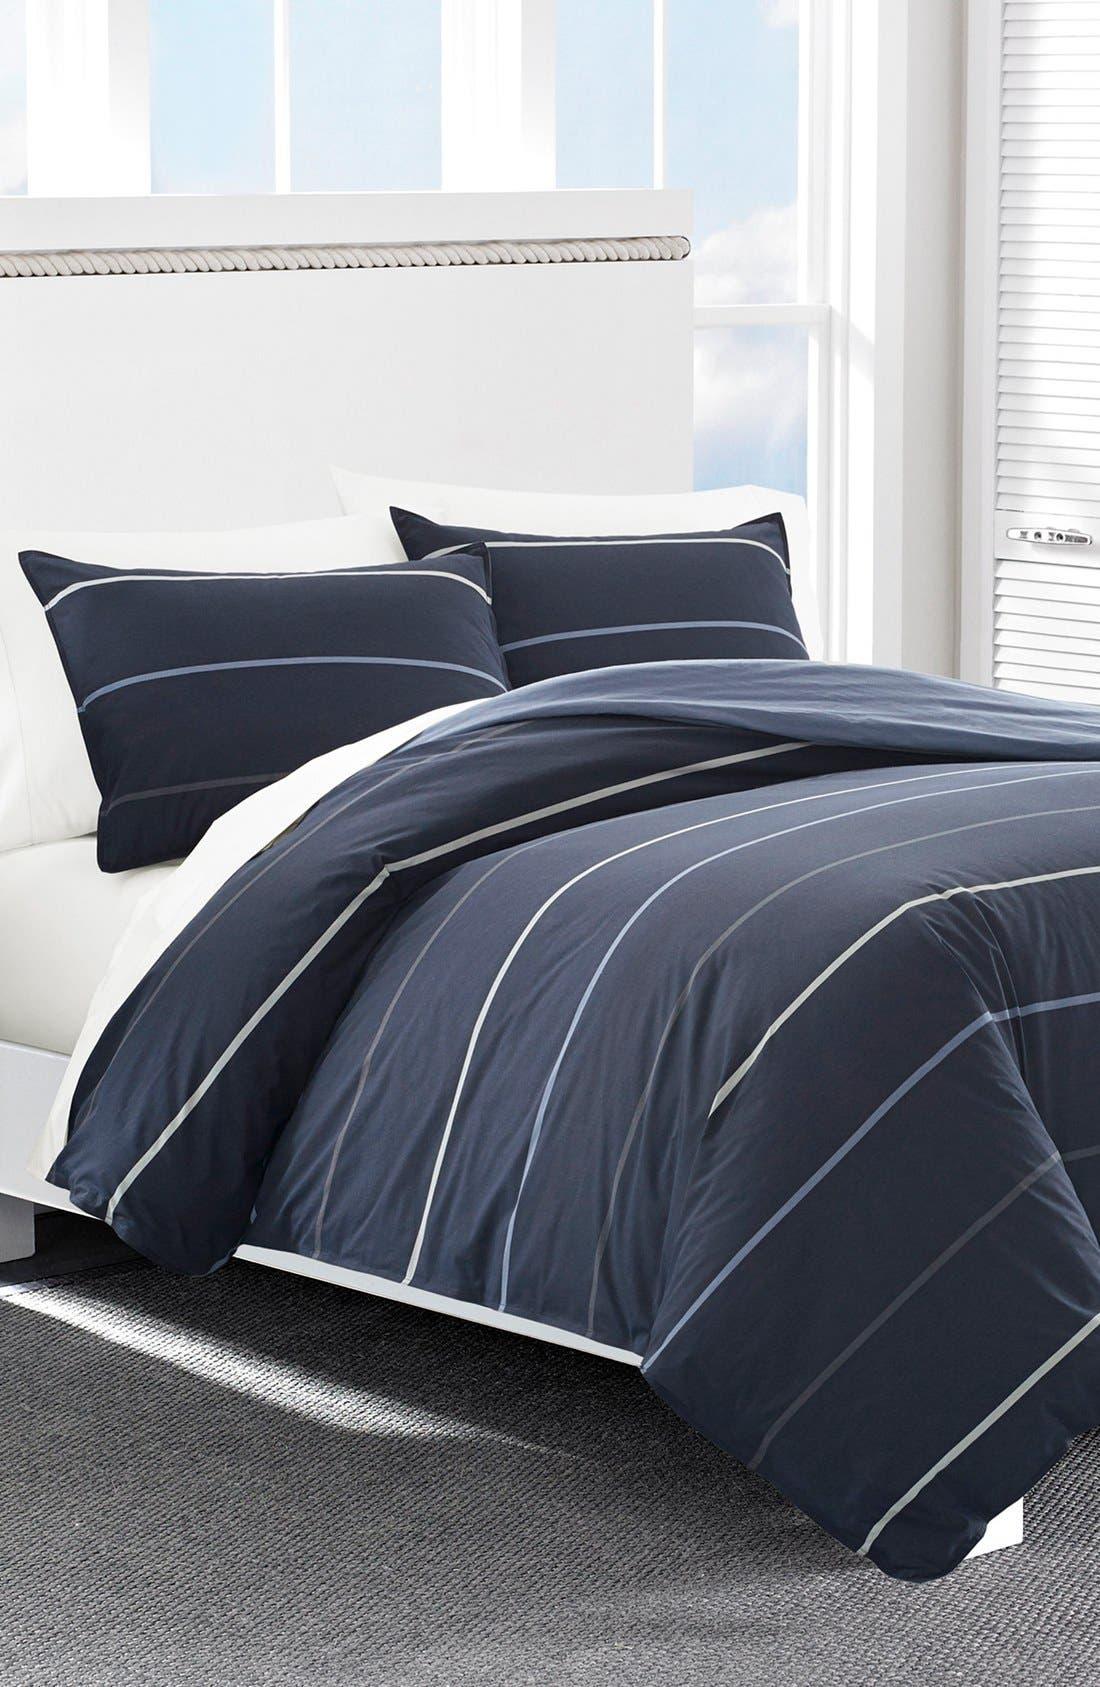 NAUTICA Southport Comforter & Sham Set